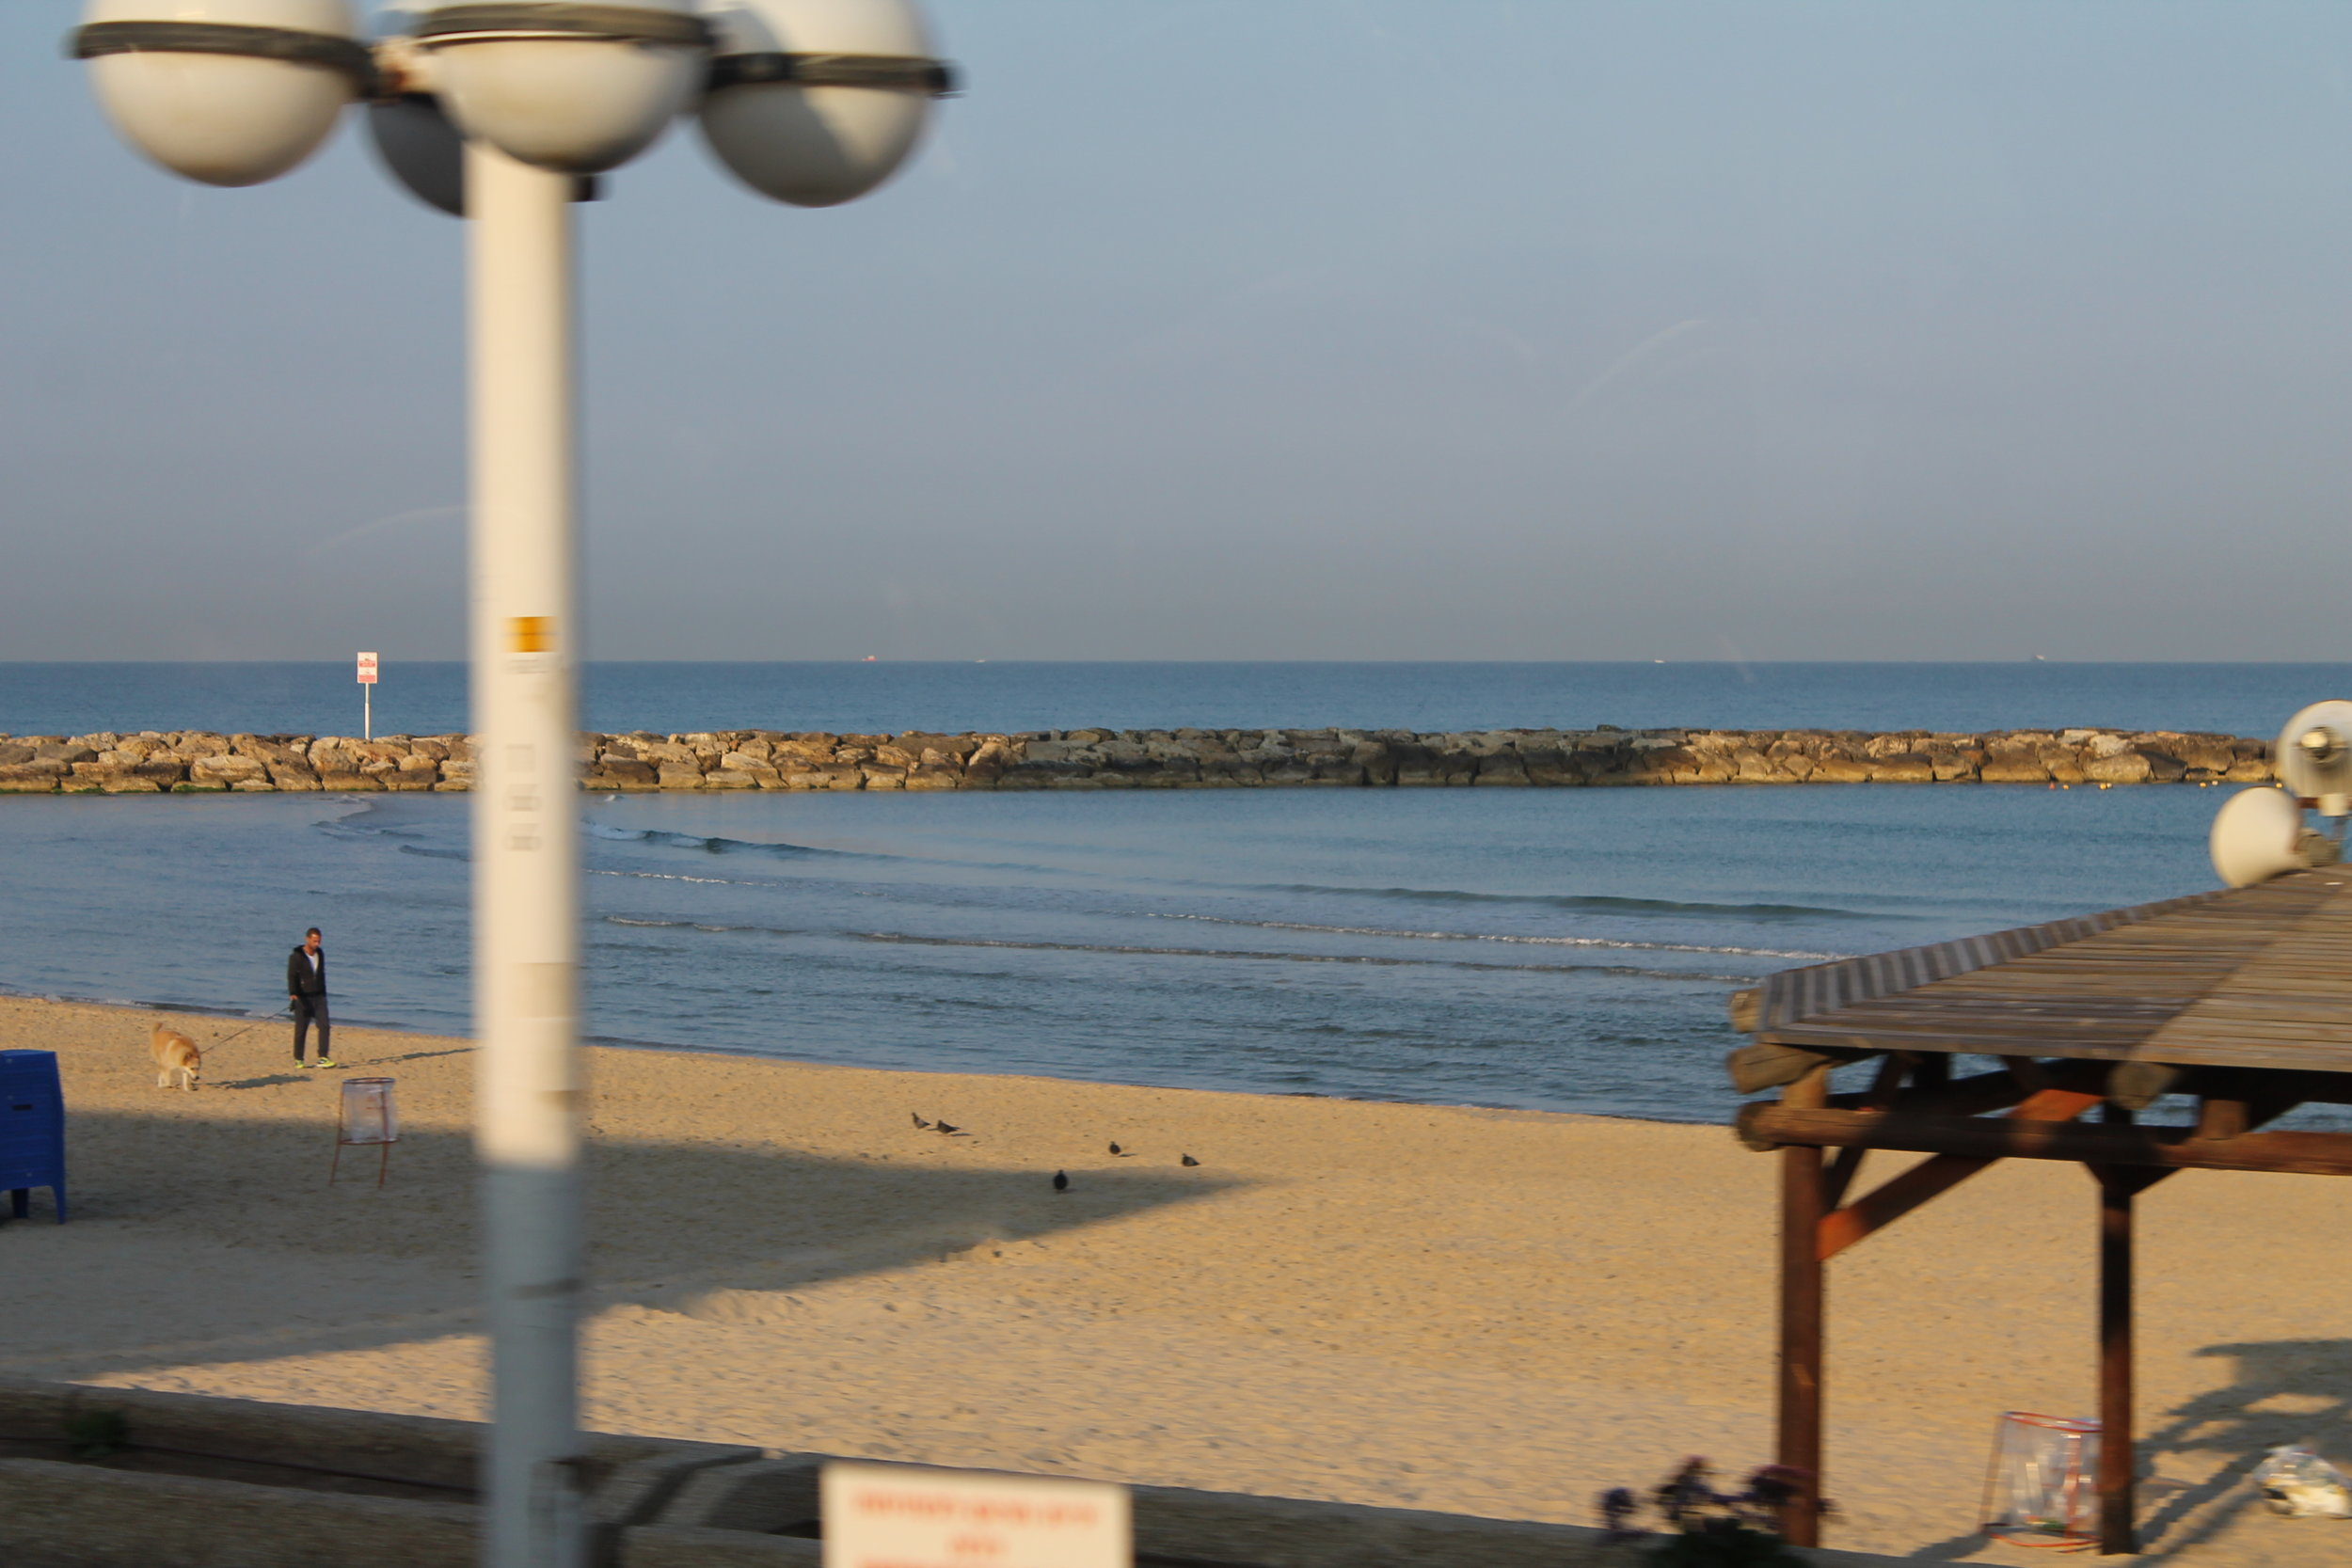 The port of Jaffa.